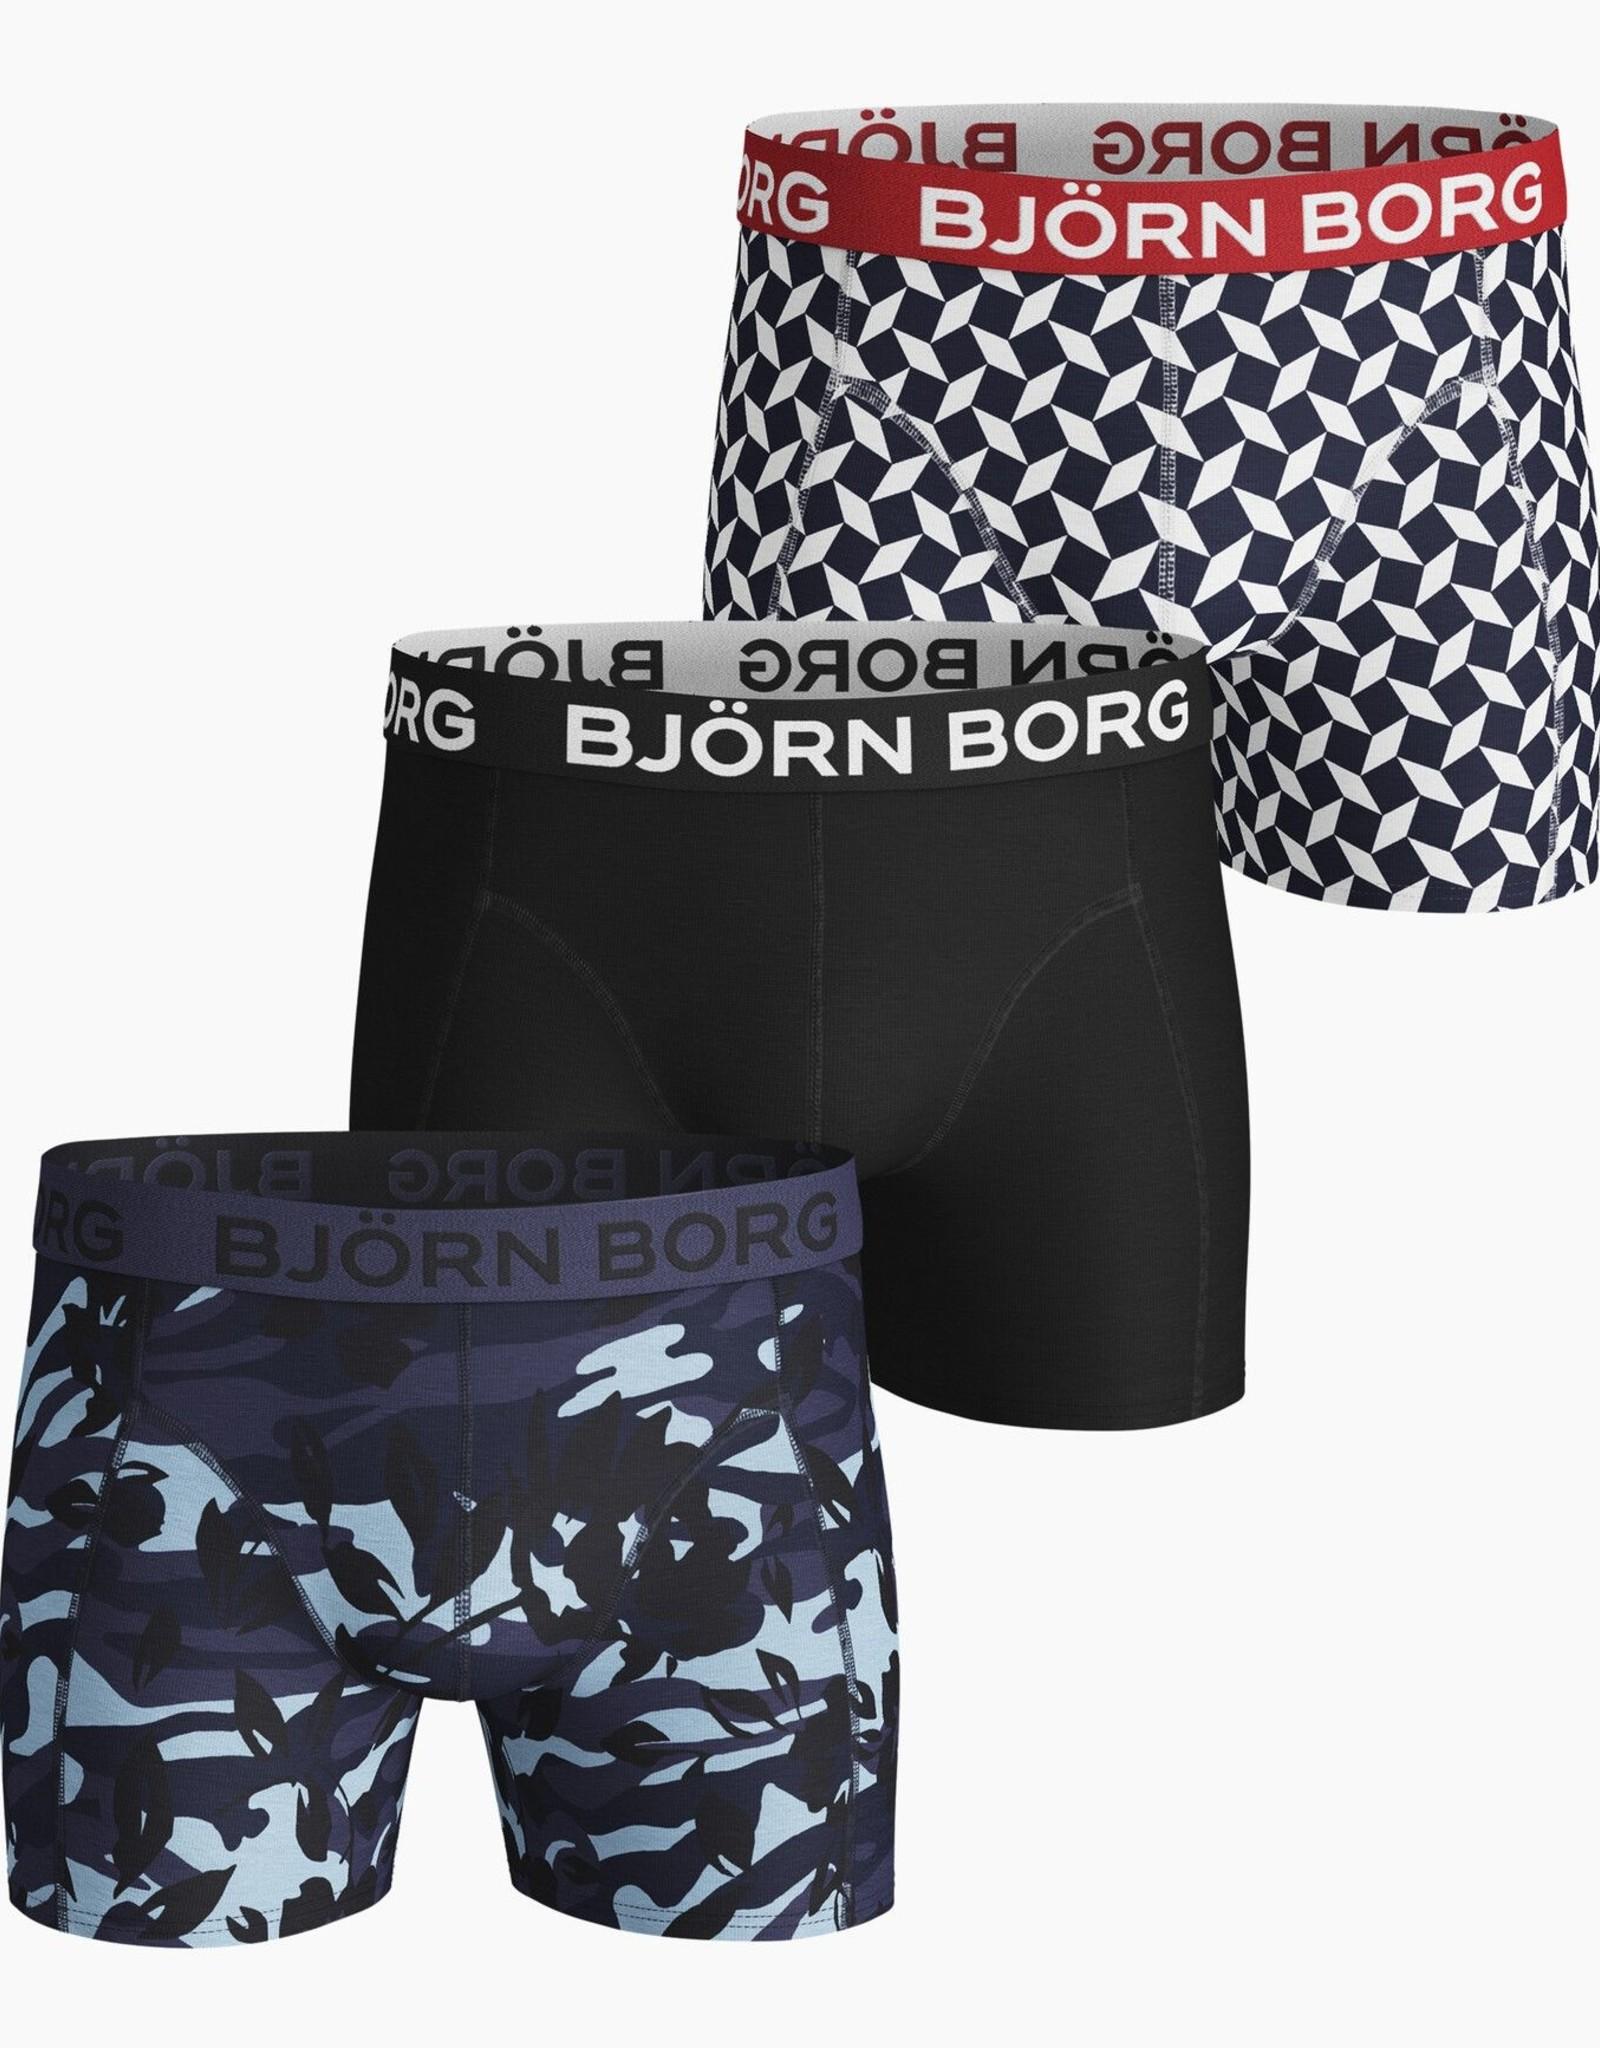 Bjorn Borg Boxershort 3 Pack Camo Floral